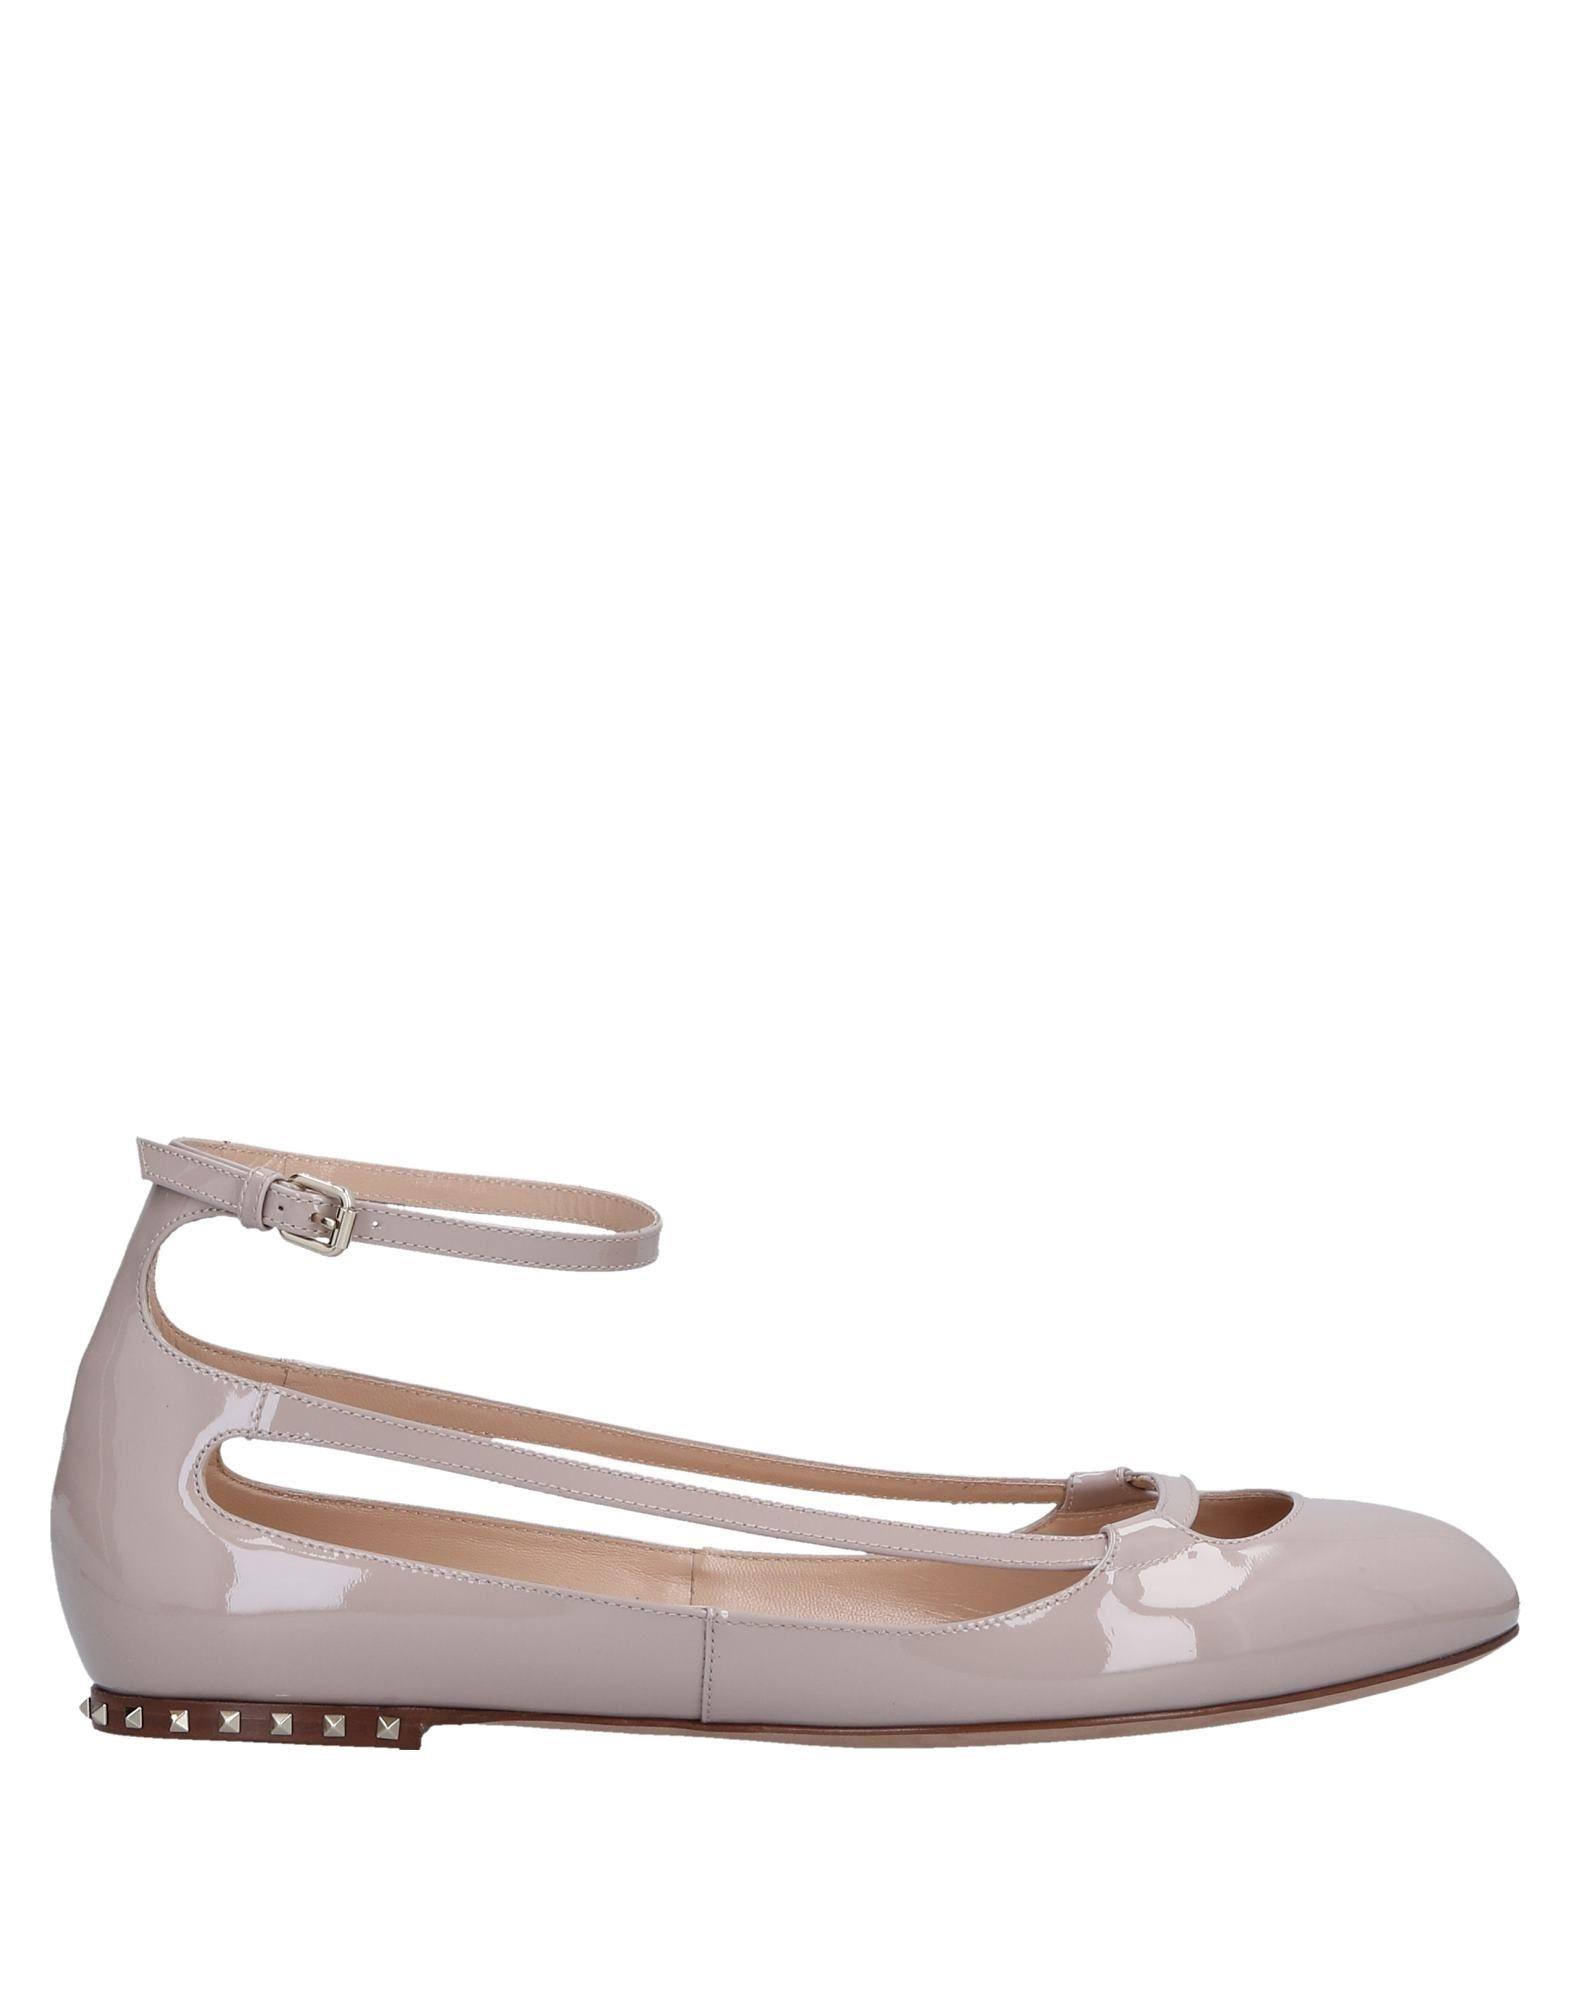 Valentino Garavani Ballet Flats - Women Valentino Garavani  Ballet Flats online on  Garavani United Kingdom - 11540437JS b11181